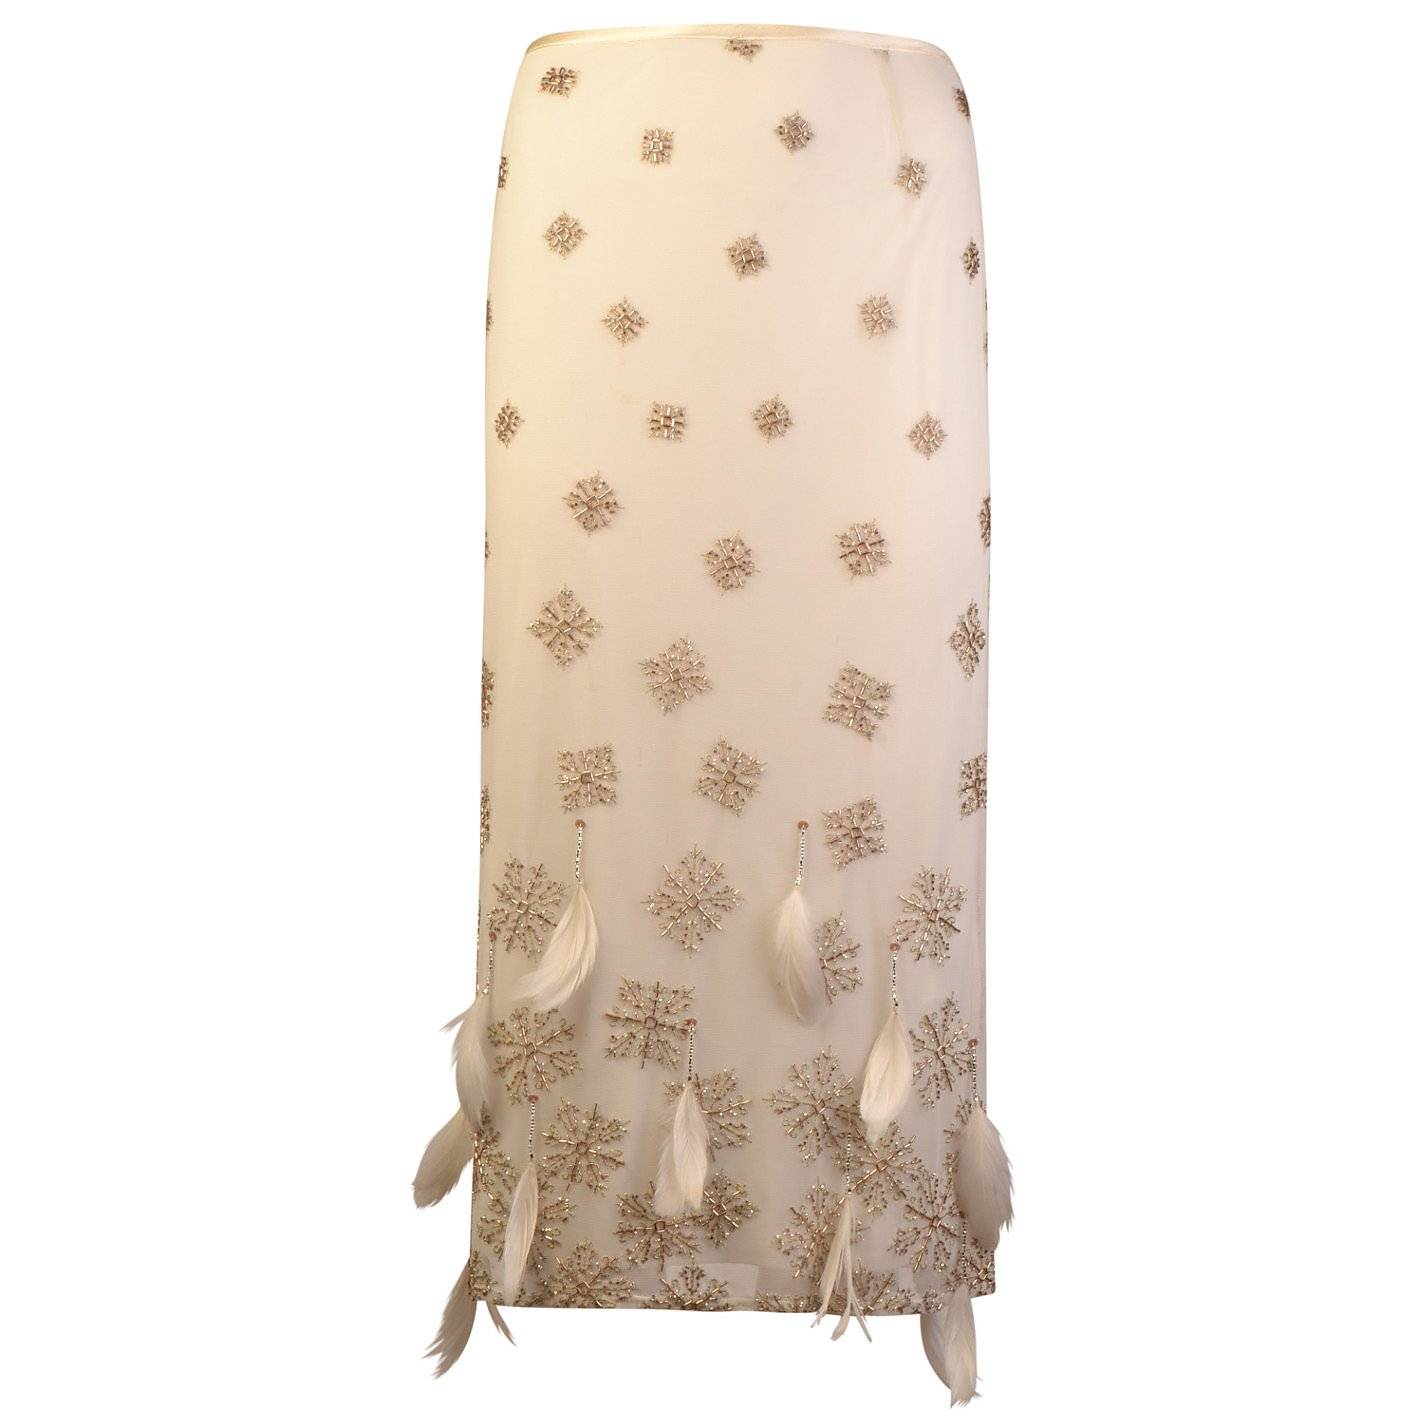 Karen Millen Bead & Feather Embellished Skirt